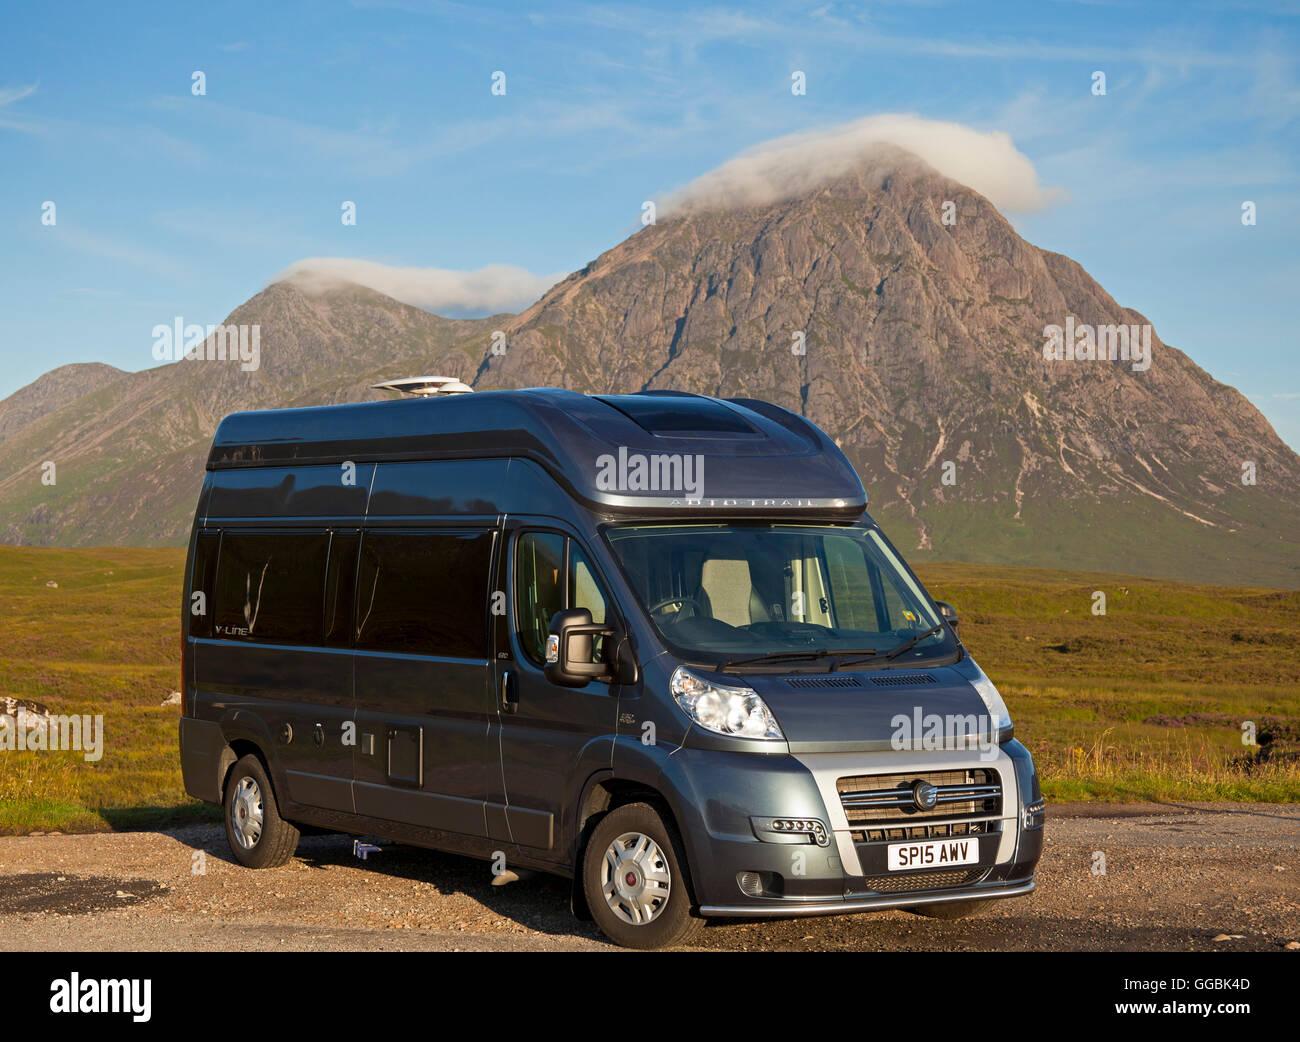 Camper van in foreground with Buchaille Etive Mor in background Lochaber Scotland UK - Stock Image